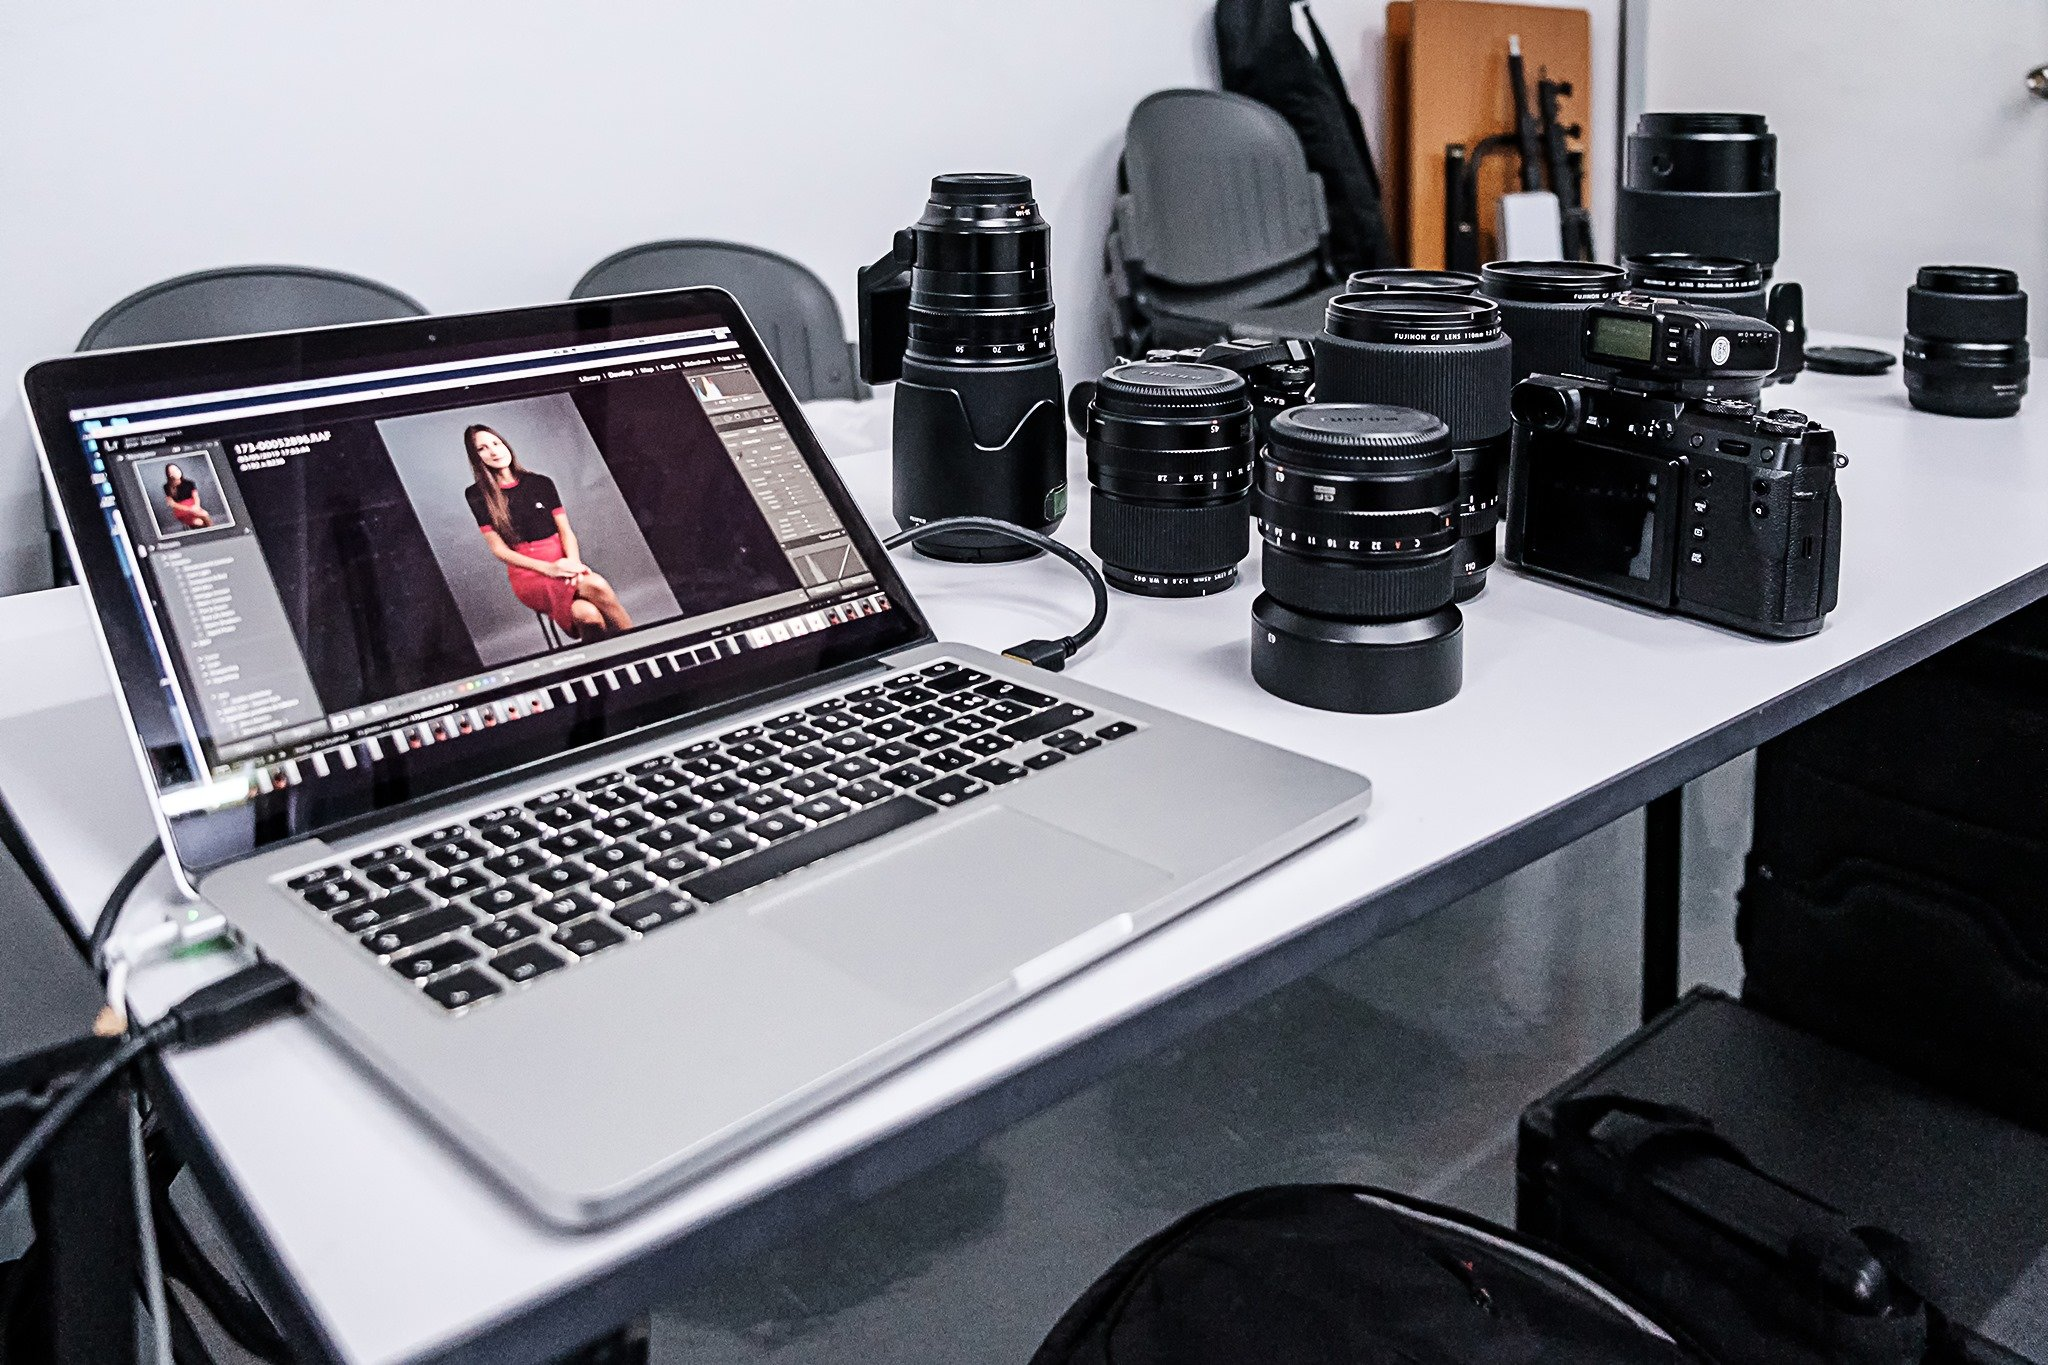 Photography Workshop PSS FUJIFILM GFX 50R GFX 50S Singapore Jose Jeuland Photographer studio shoot model medium format camera